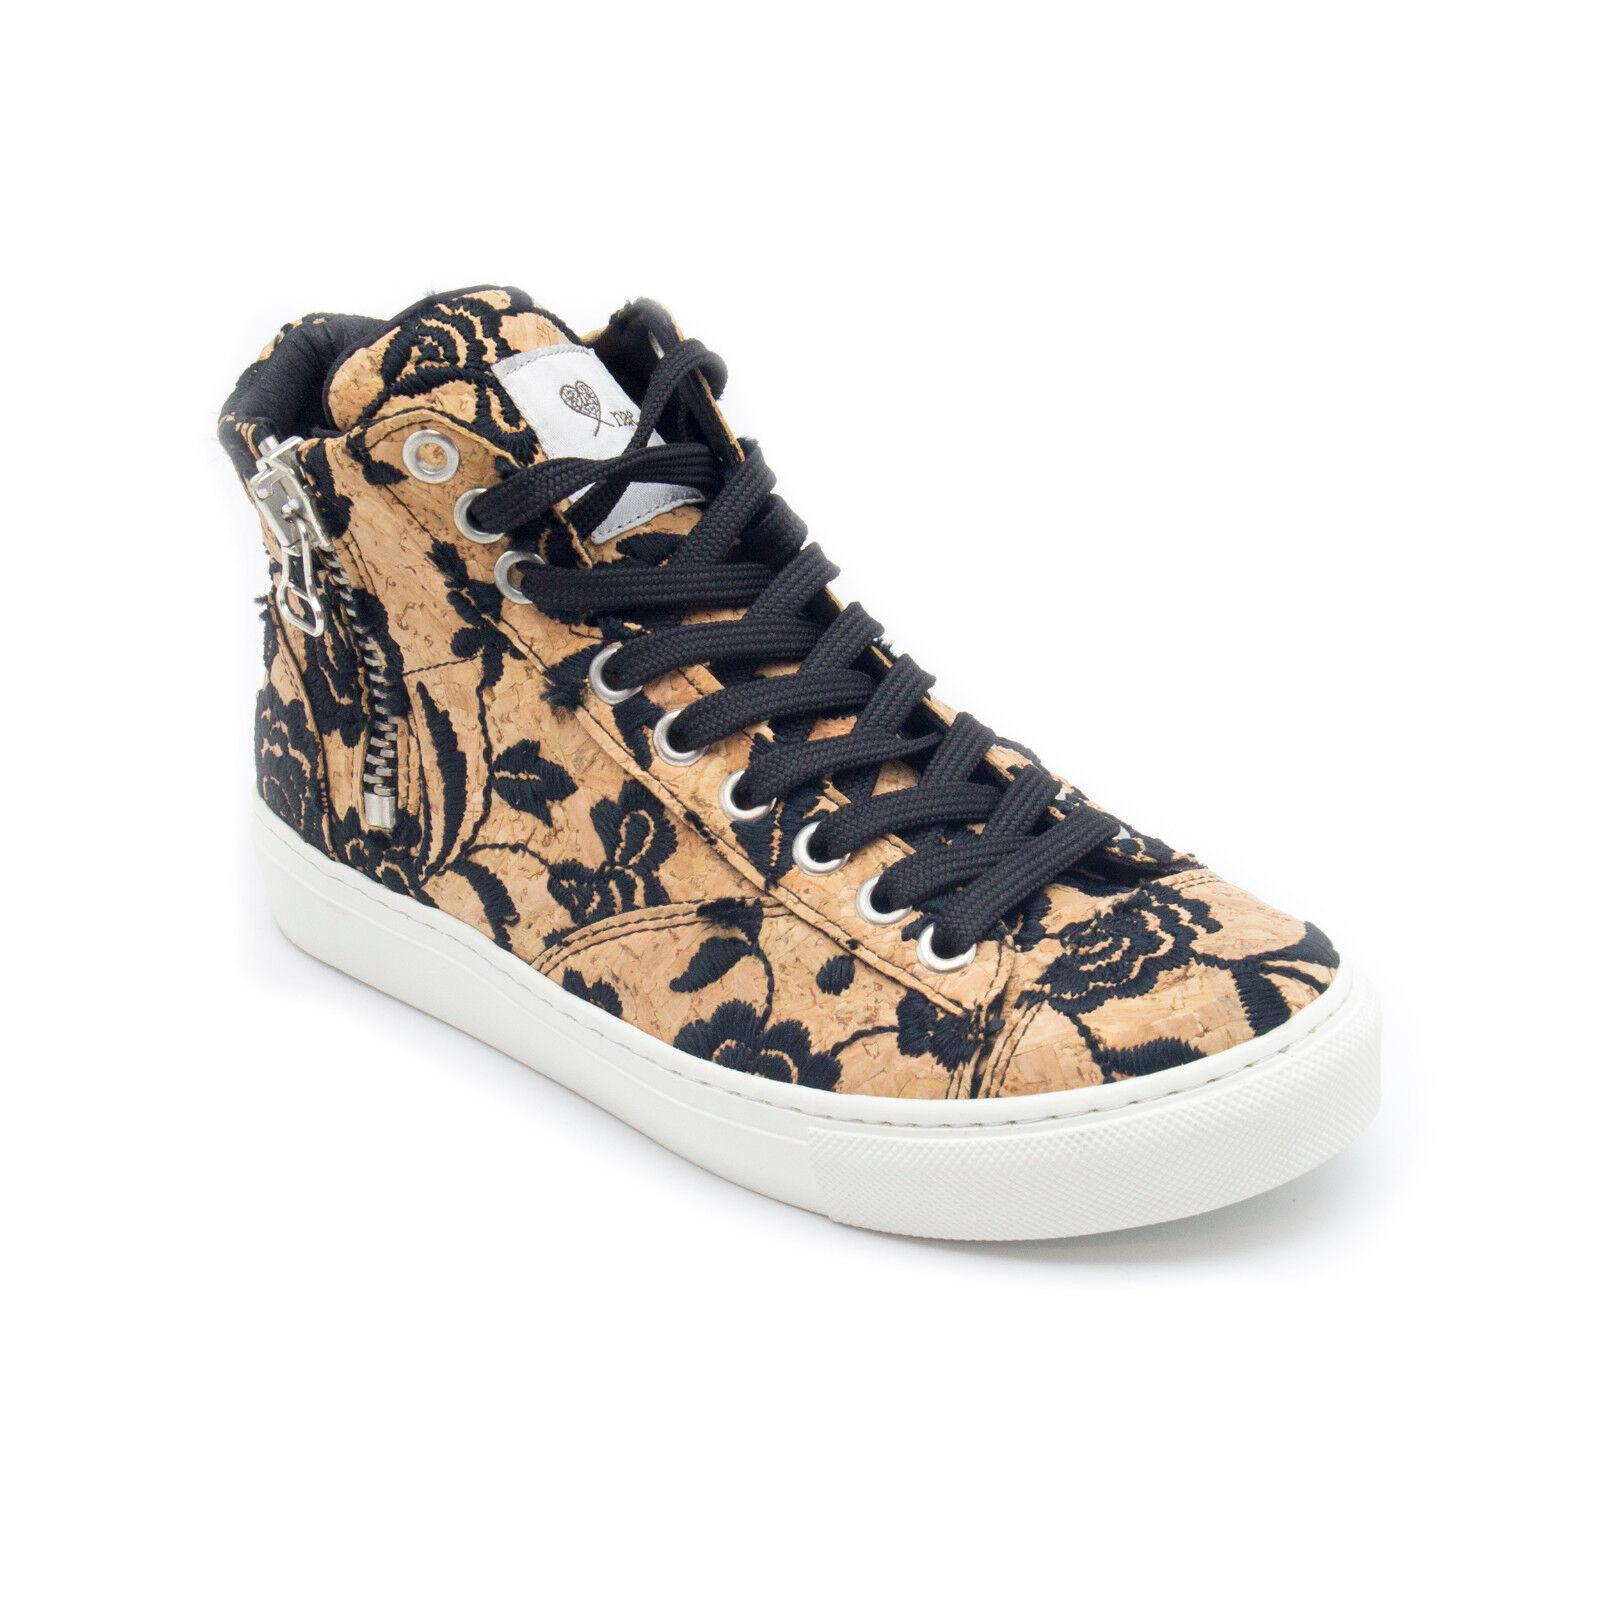 nae - Vegan ankle sneakers laces  zip Chaussures veganas cordones y cremallera